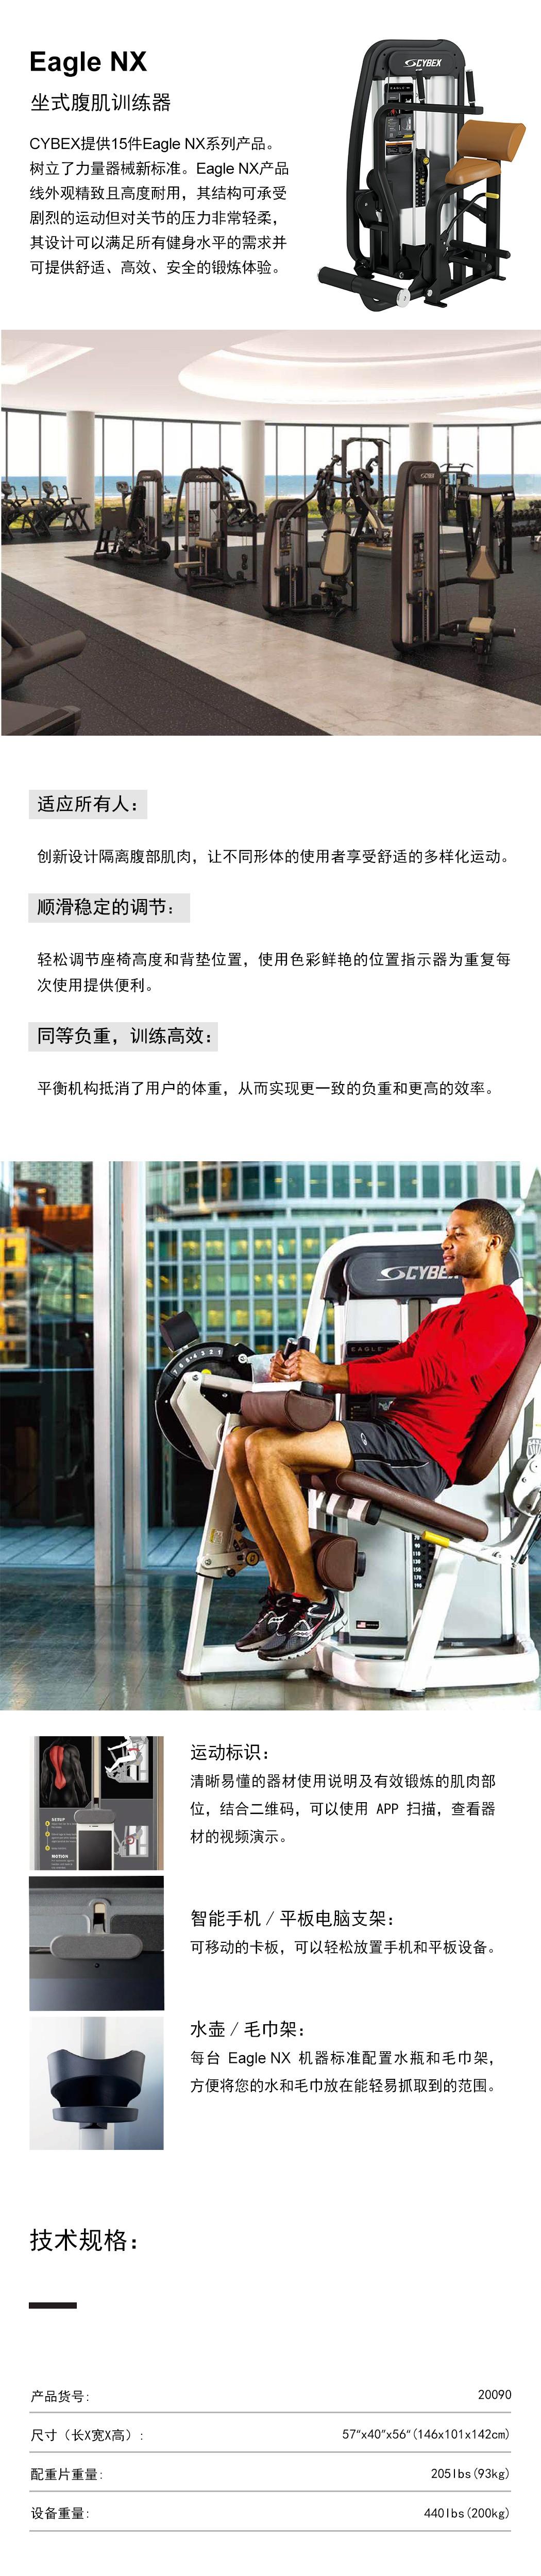 cybex-坐式腹肌训练器.jpg